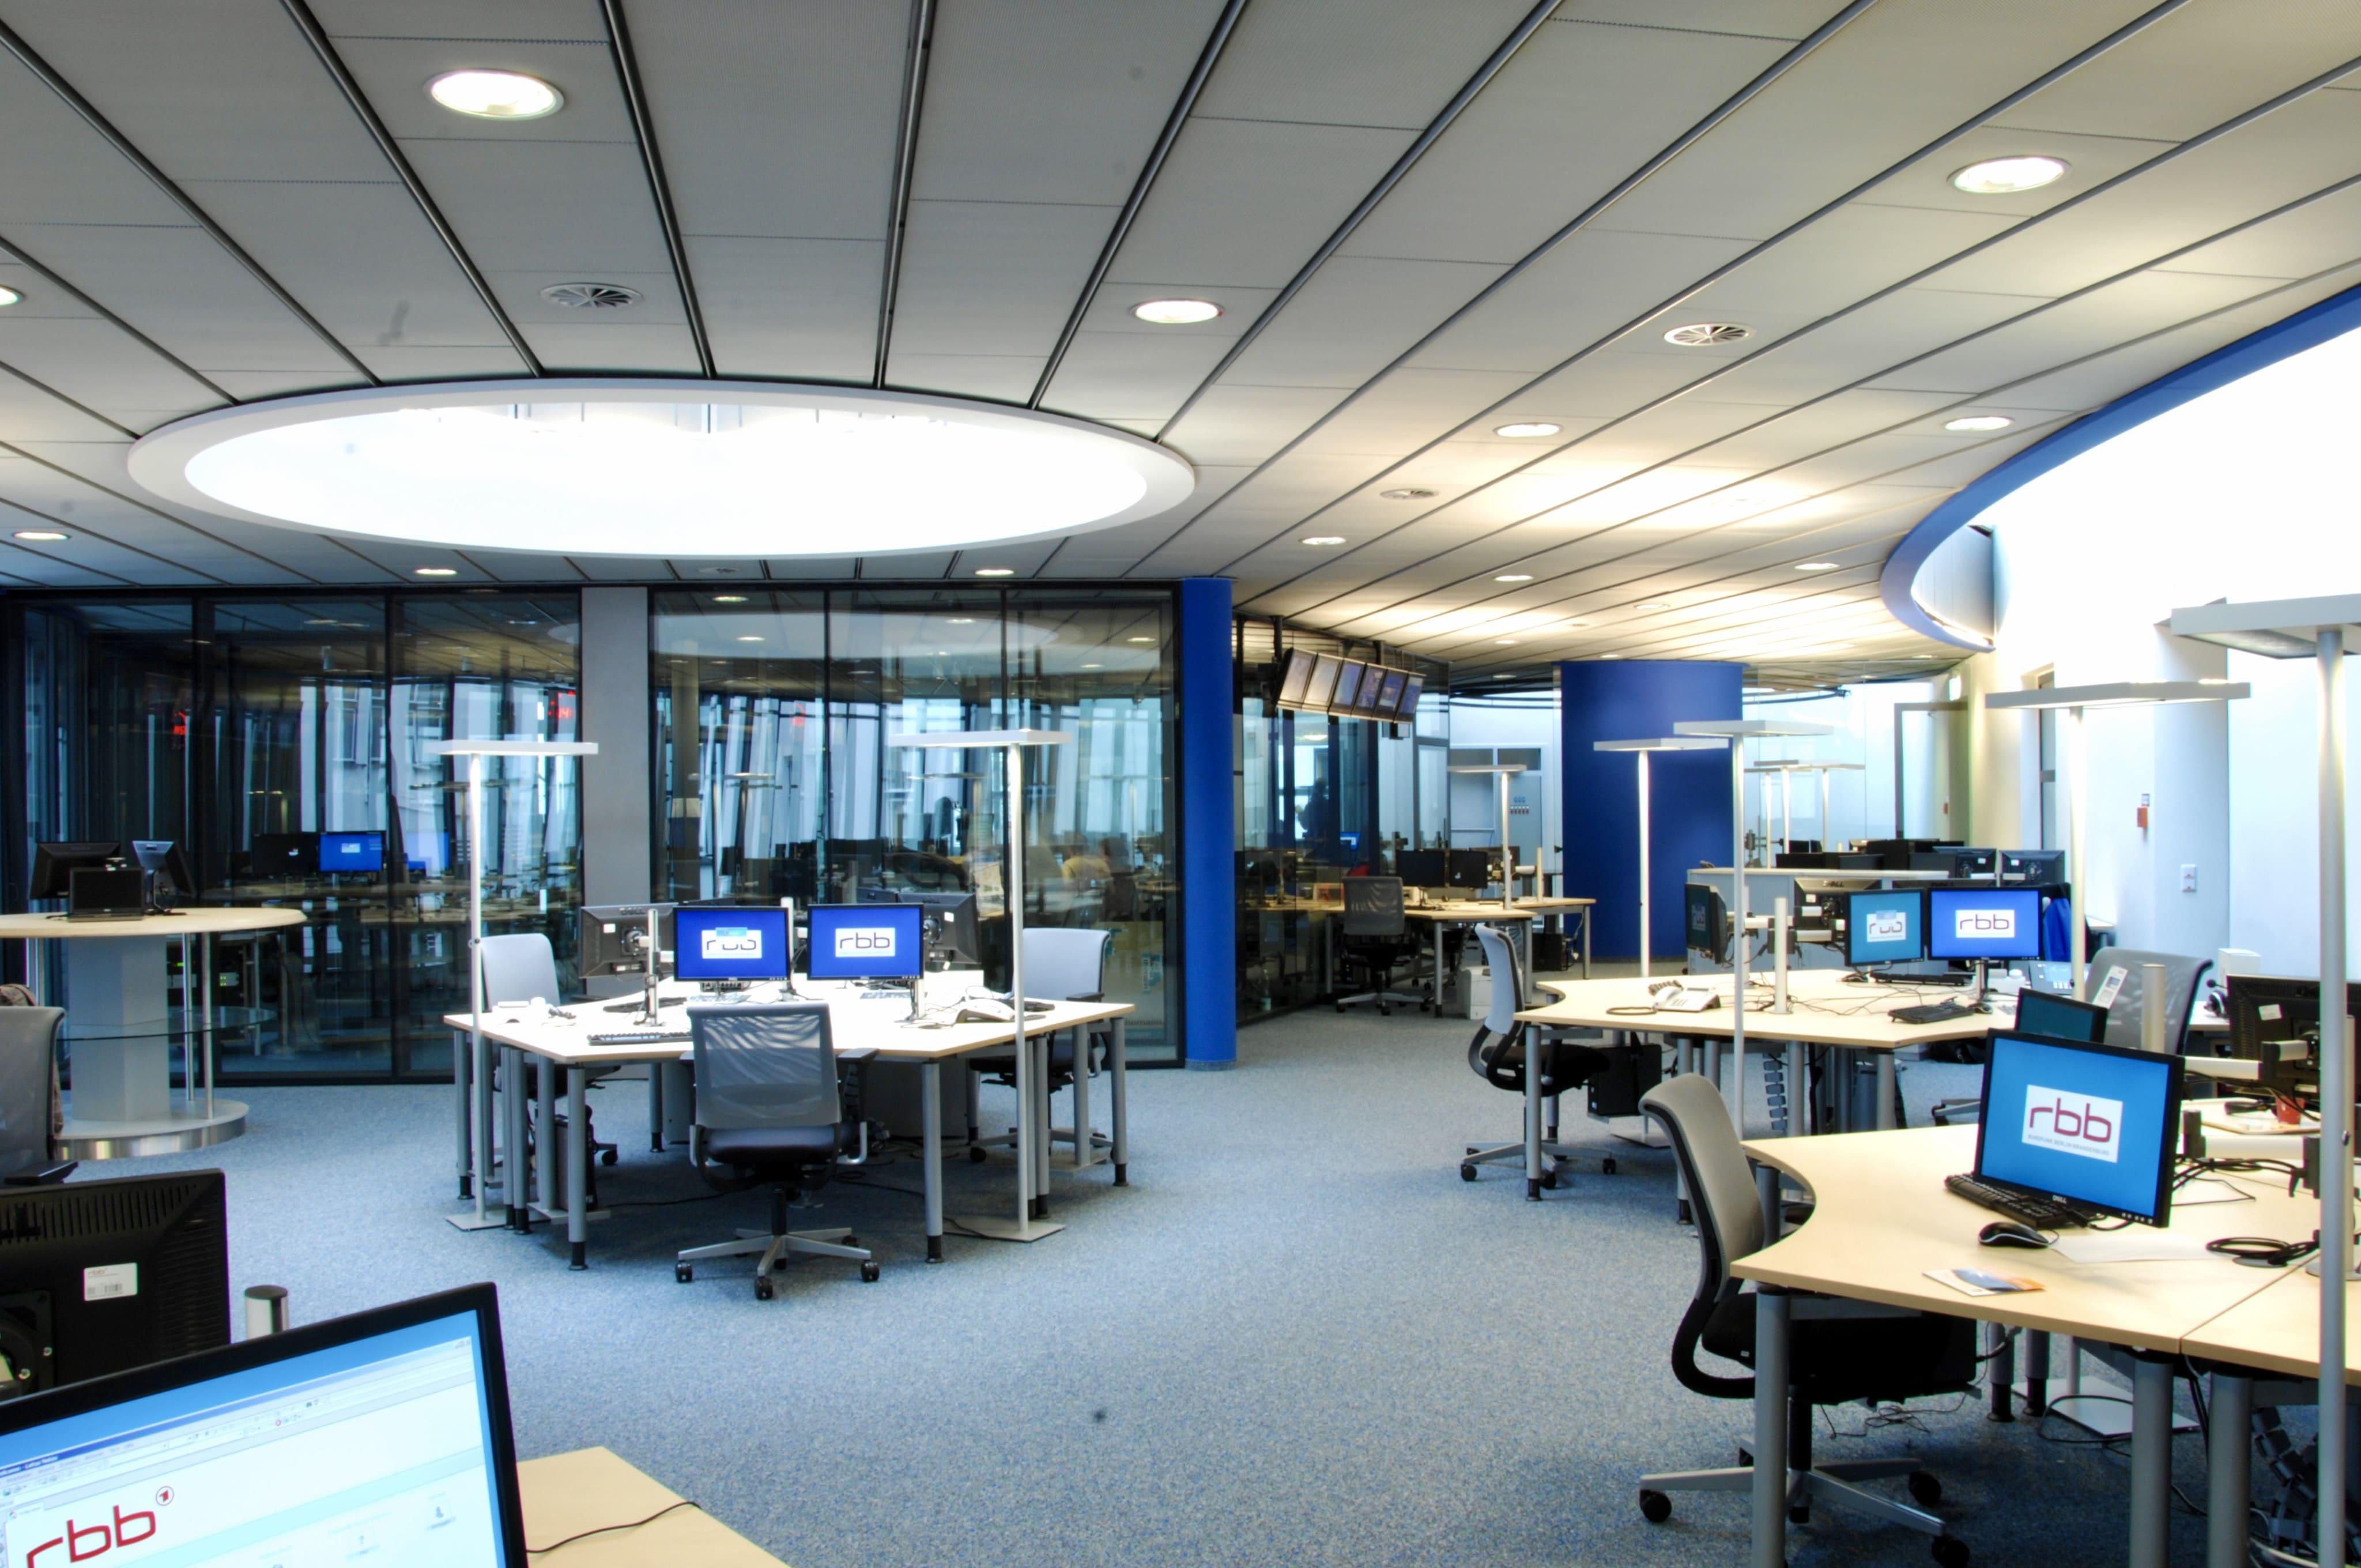 RBB Büro Elektroinstallation